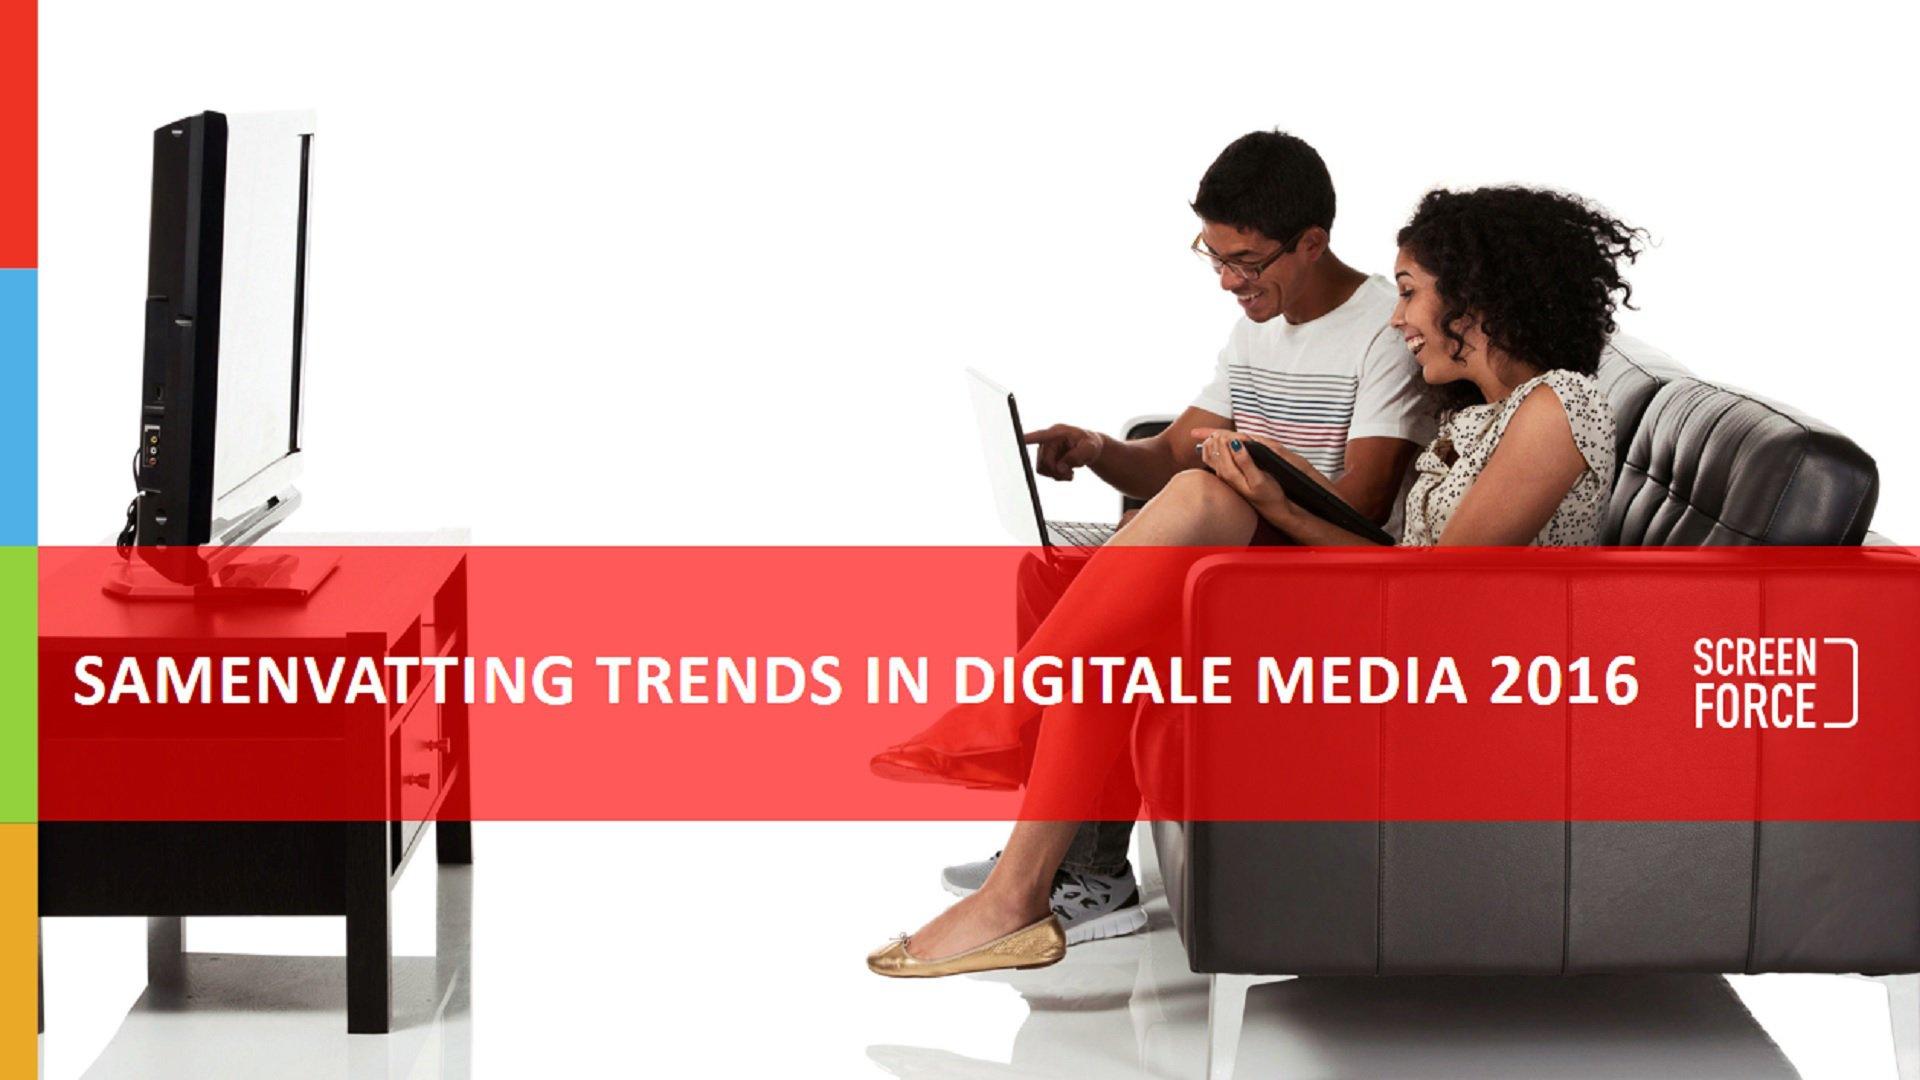 Screenforce Trends in Digitale Media